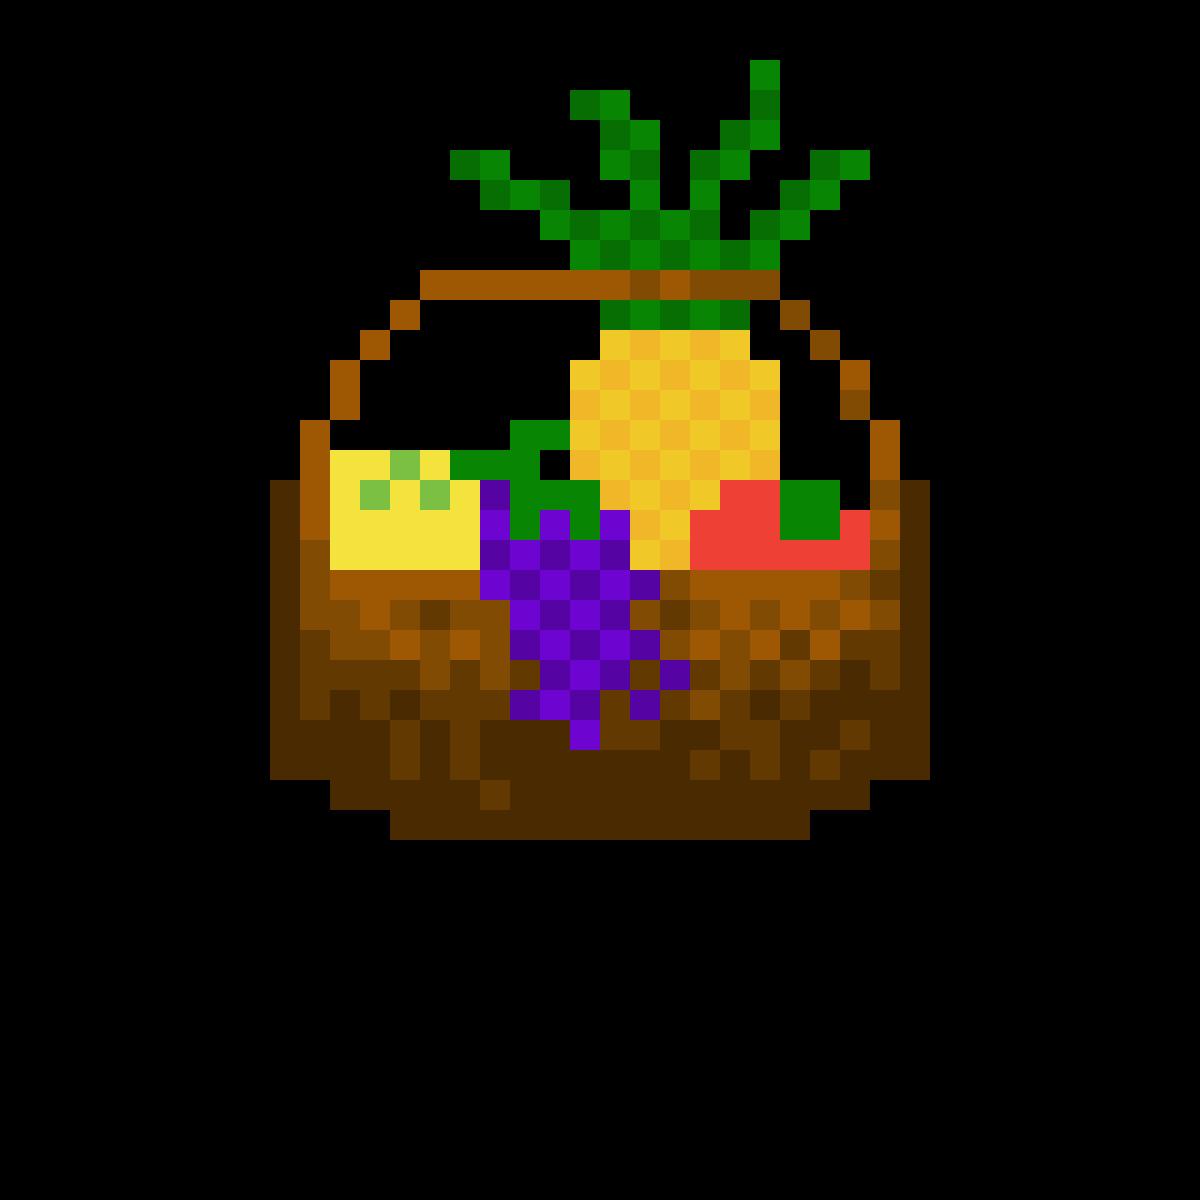 Pixilart Fruit Basket For Elon Musk For Hosting Meme Review By Chocolate Chips